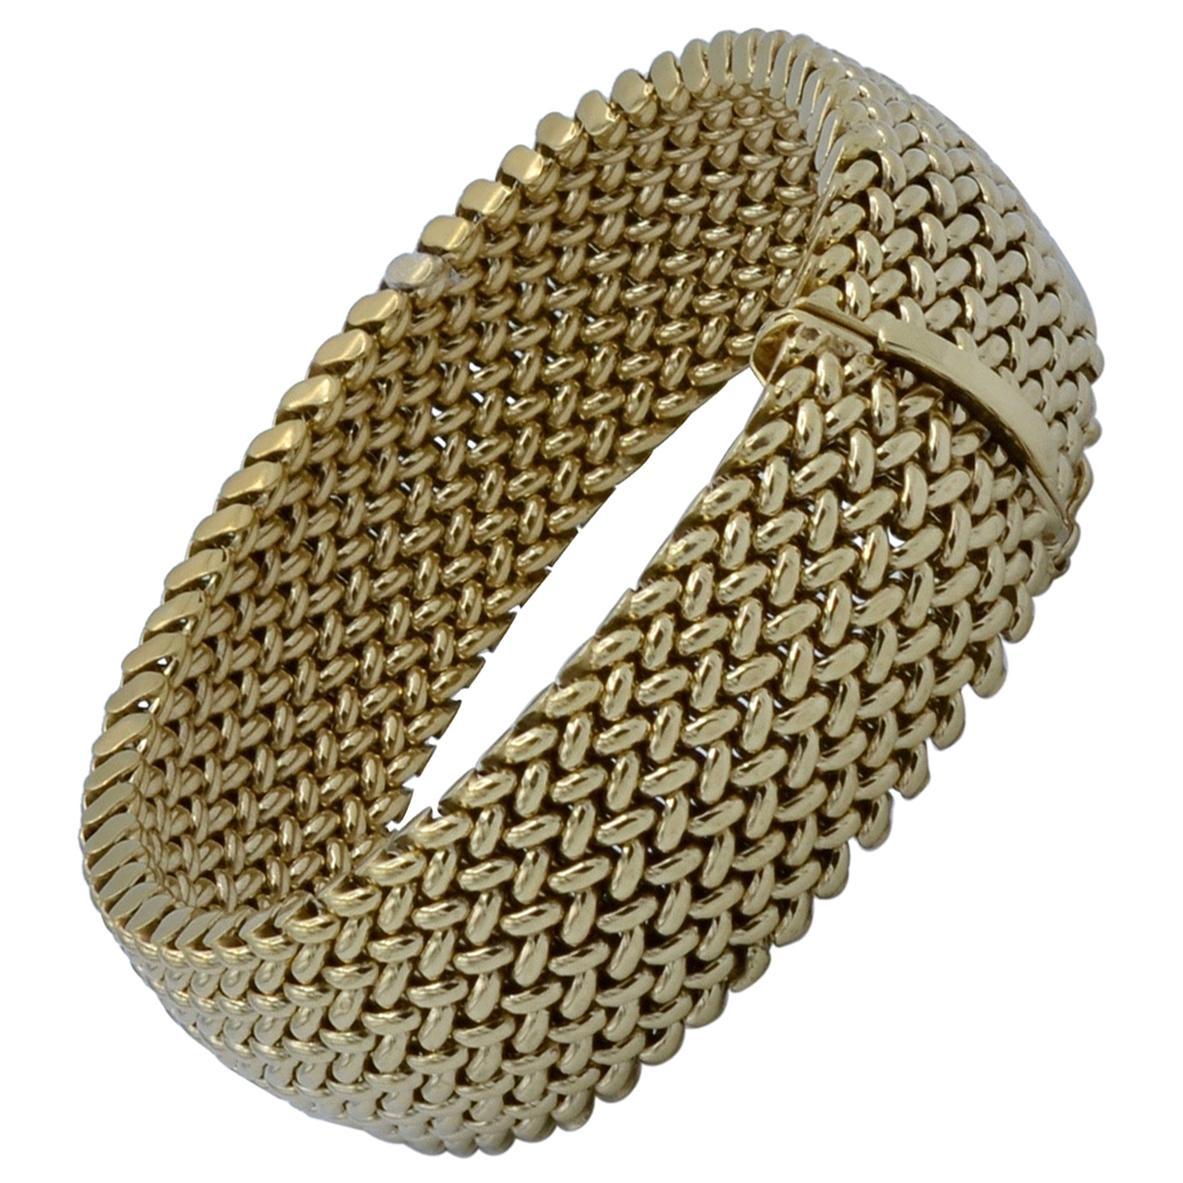 Italian 14 Carat Gold Mesh Bracelet